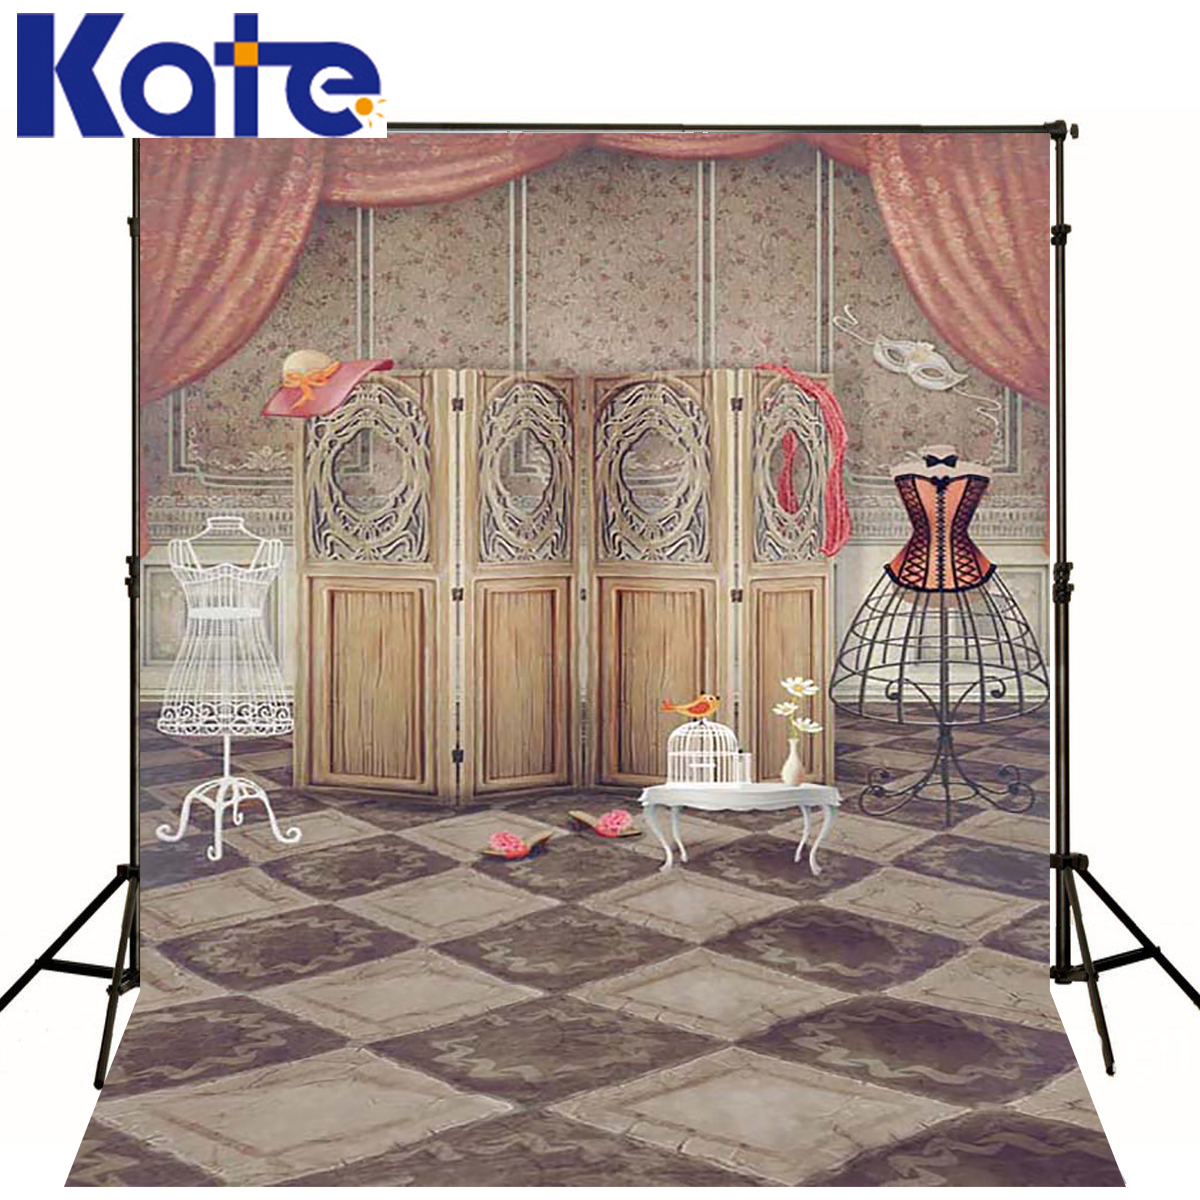 KATE Indoor Wedding Newborn Backdrop Old Room Photography Backdrops Newborn Aristocratic Dress Backgrounds For Photo Studio